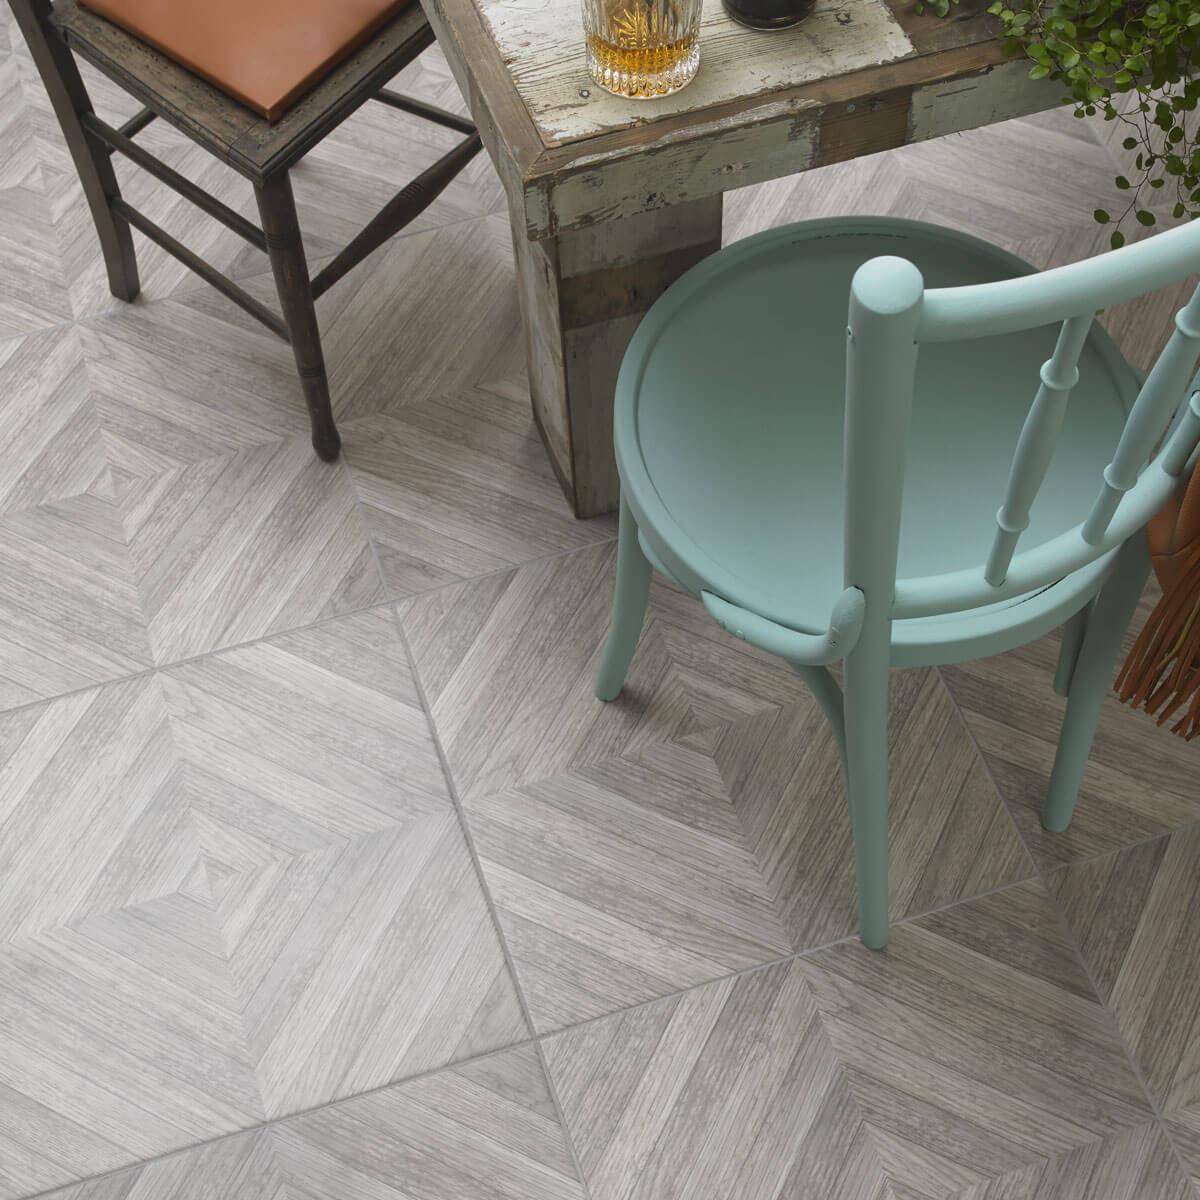 Wood effect tiles beautiful hard wearing british ceramic tile brown matt wall floor dailygadgetfo Images